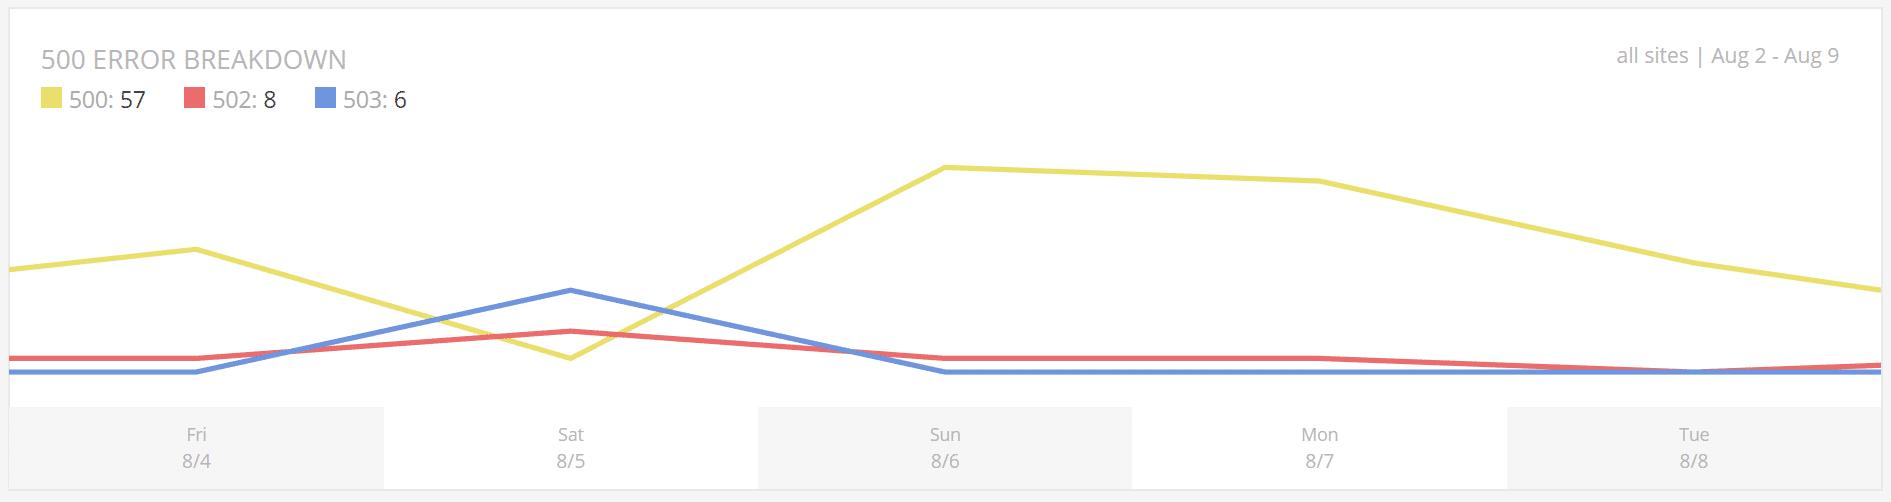 Response Analysis - 500 error breakdown